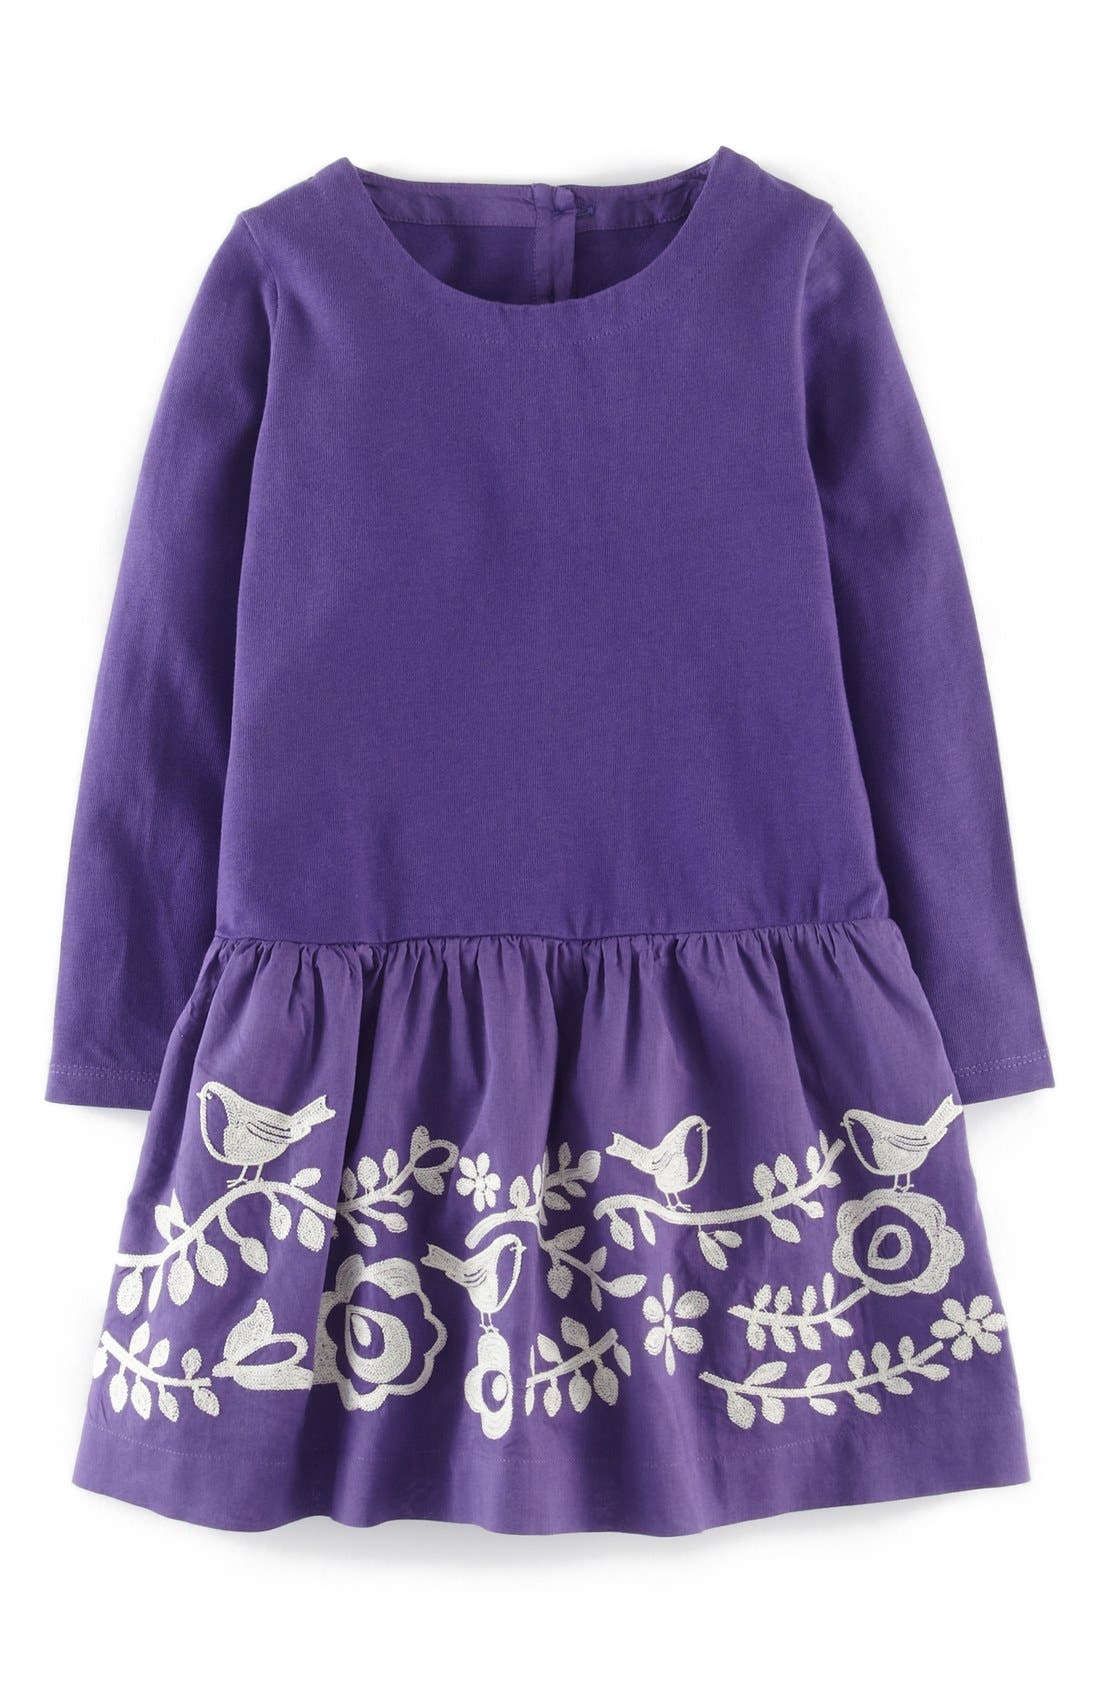 Main Image - Mini Boden Embroidered Folk Dress (Toddler Girls, Little Girls & Big Girls)